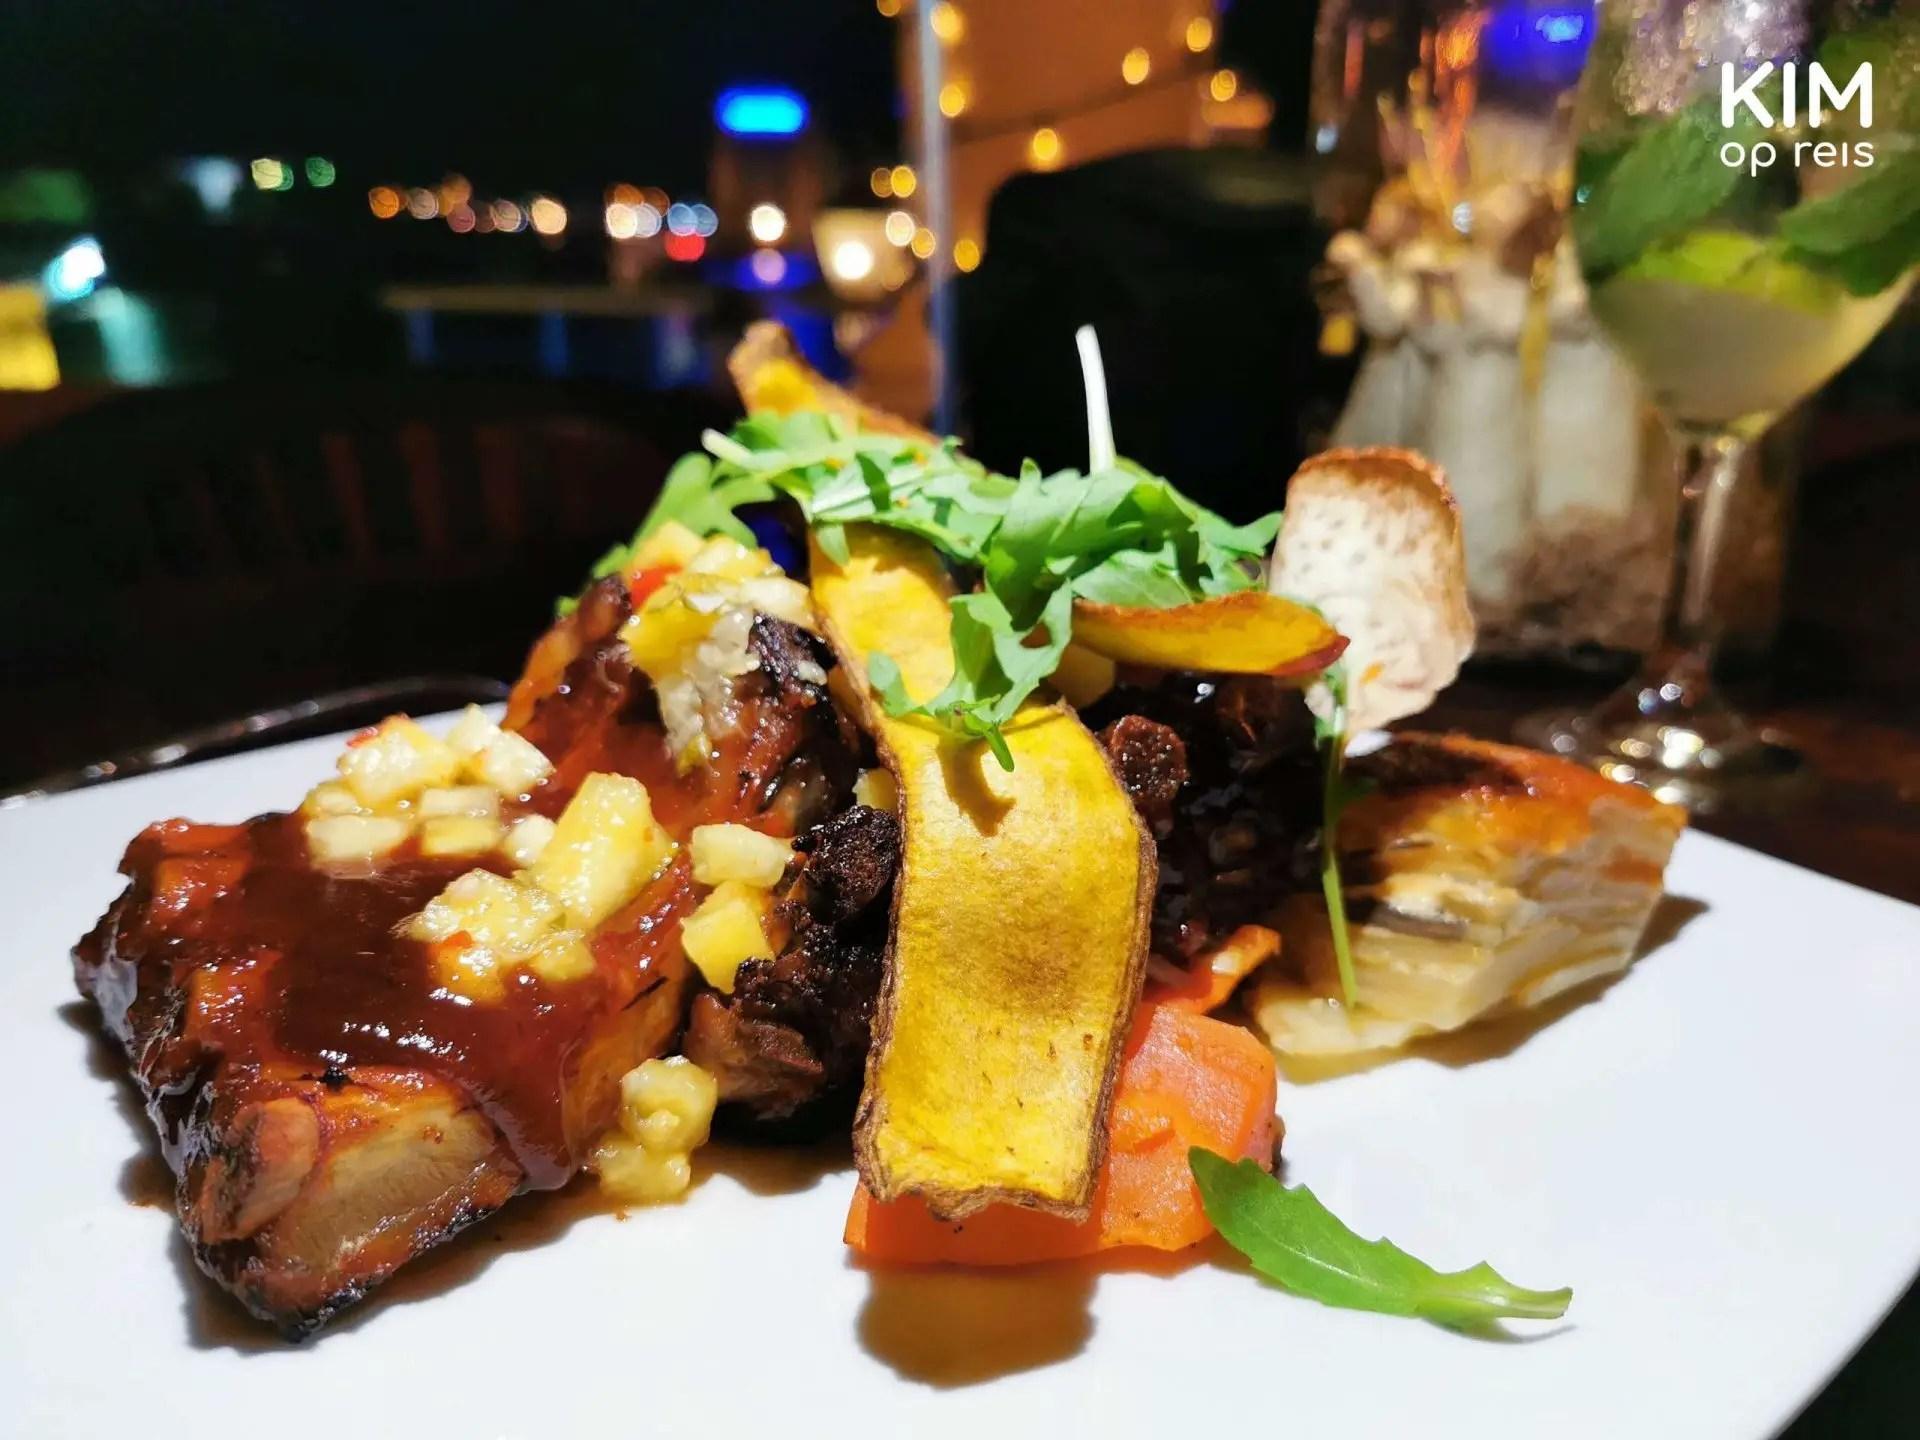 Spare ribs de Gouverneur Curaçao: beautifully prepared spare ribs on a plate